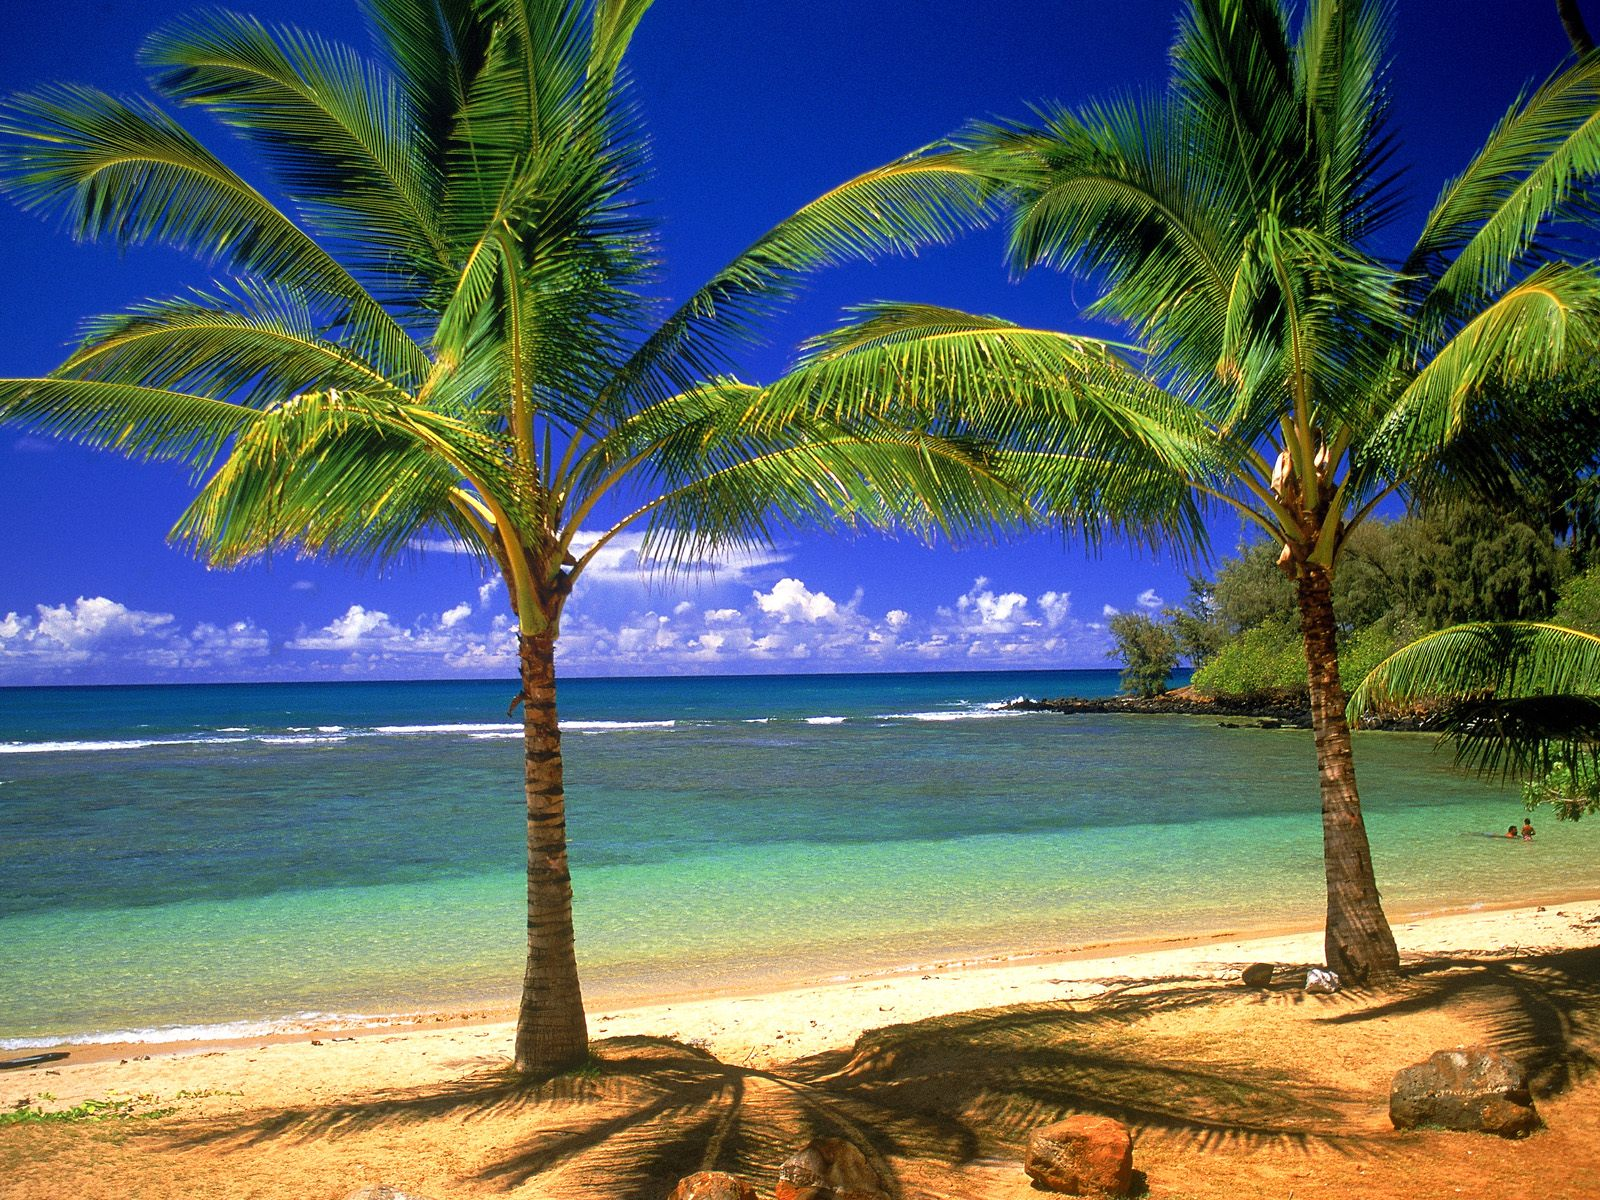 tropical beach desktop wallpaper which is under the beach wallpapers 1600x1200